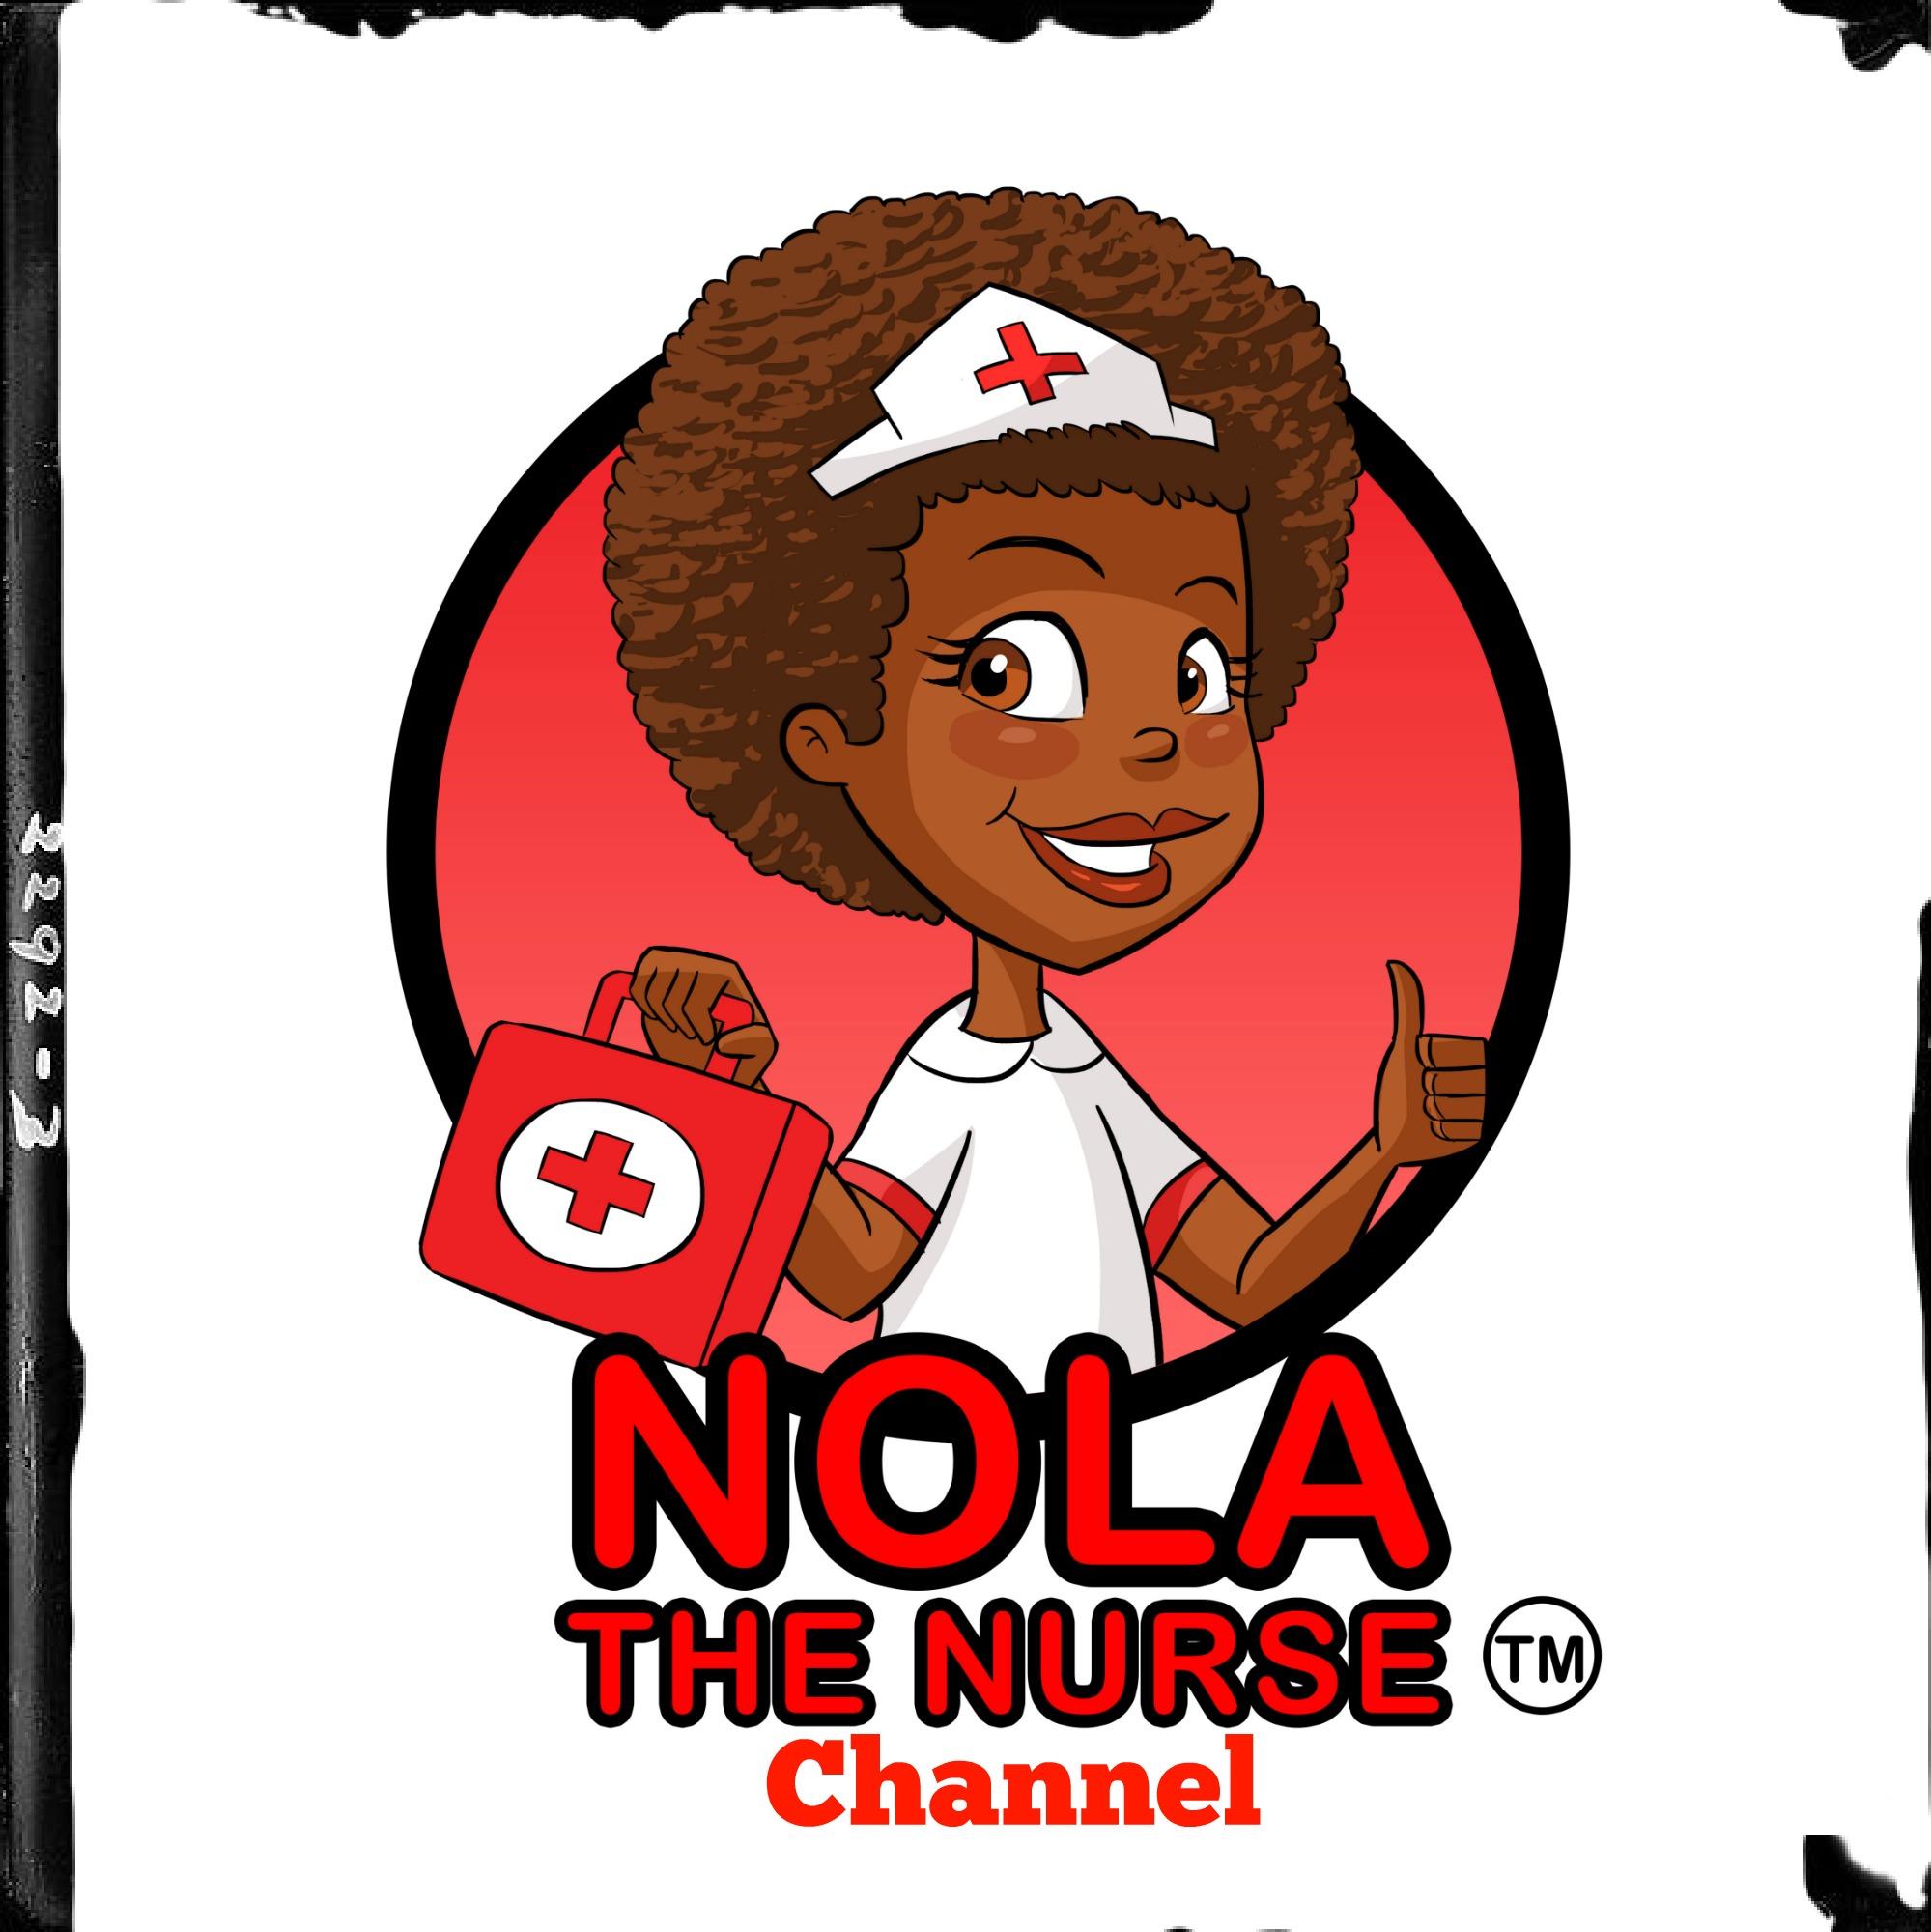 nola-the-nurse-channel-thumb